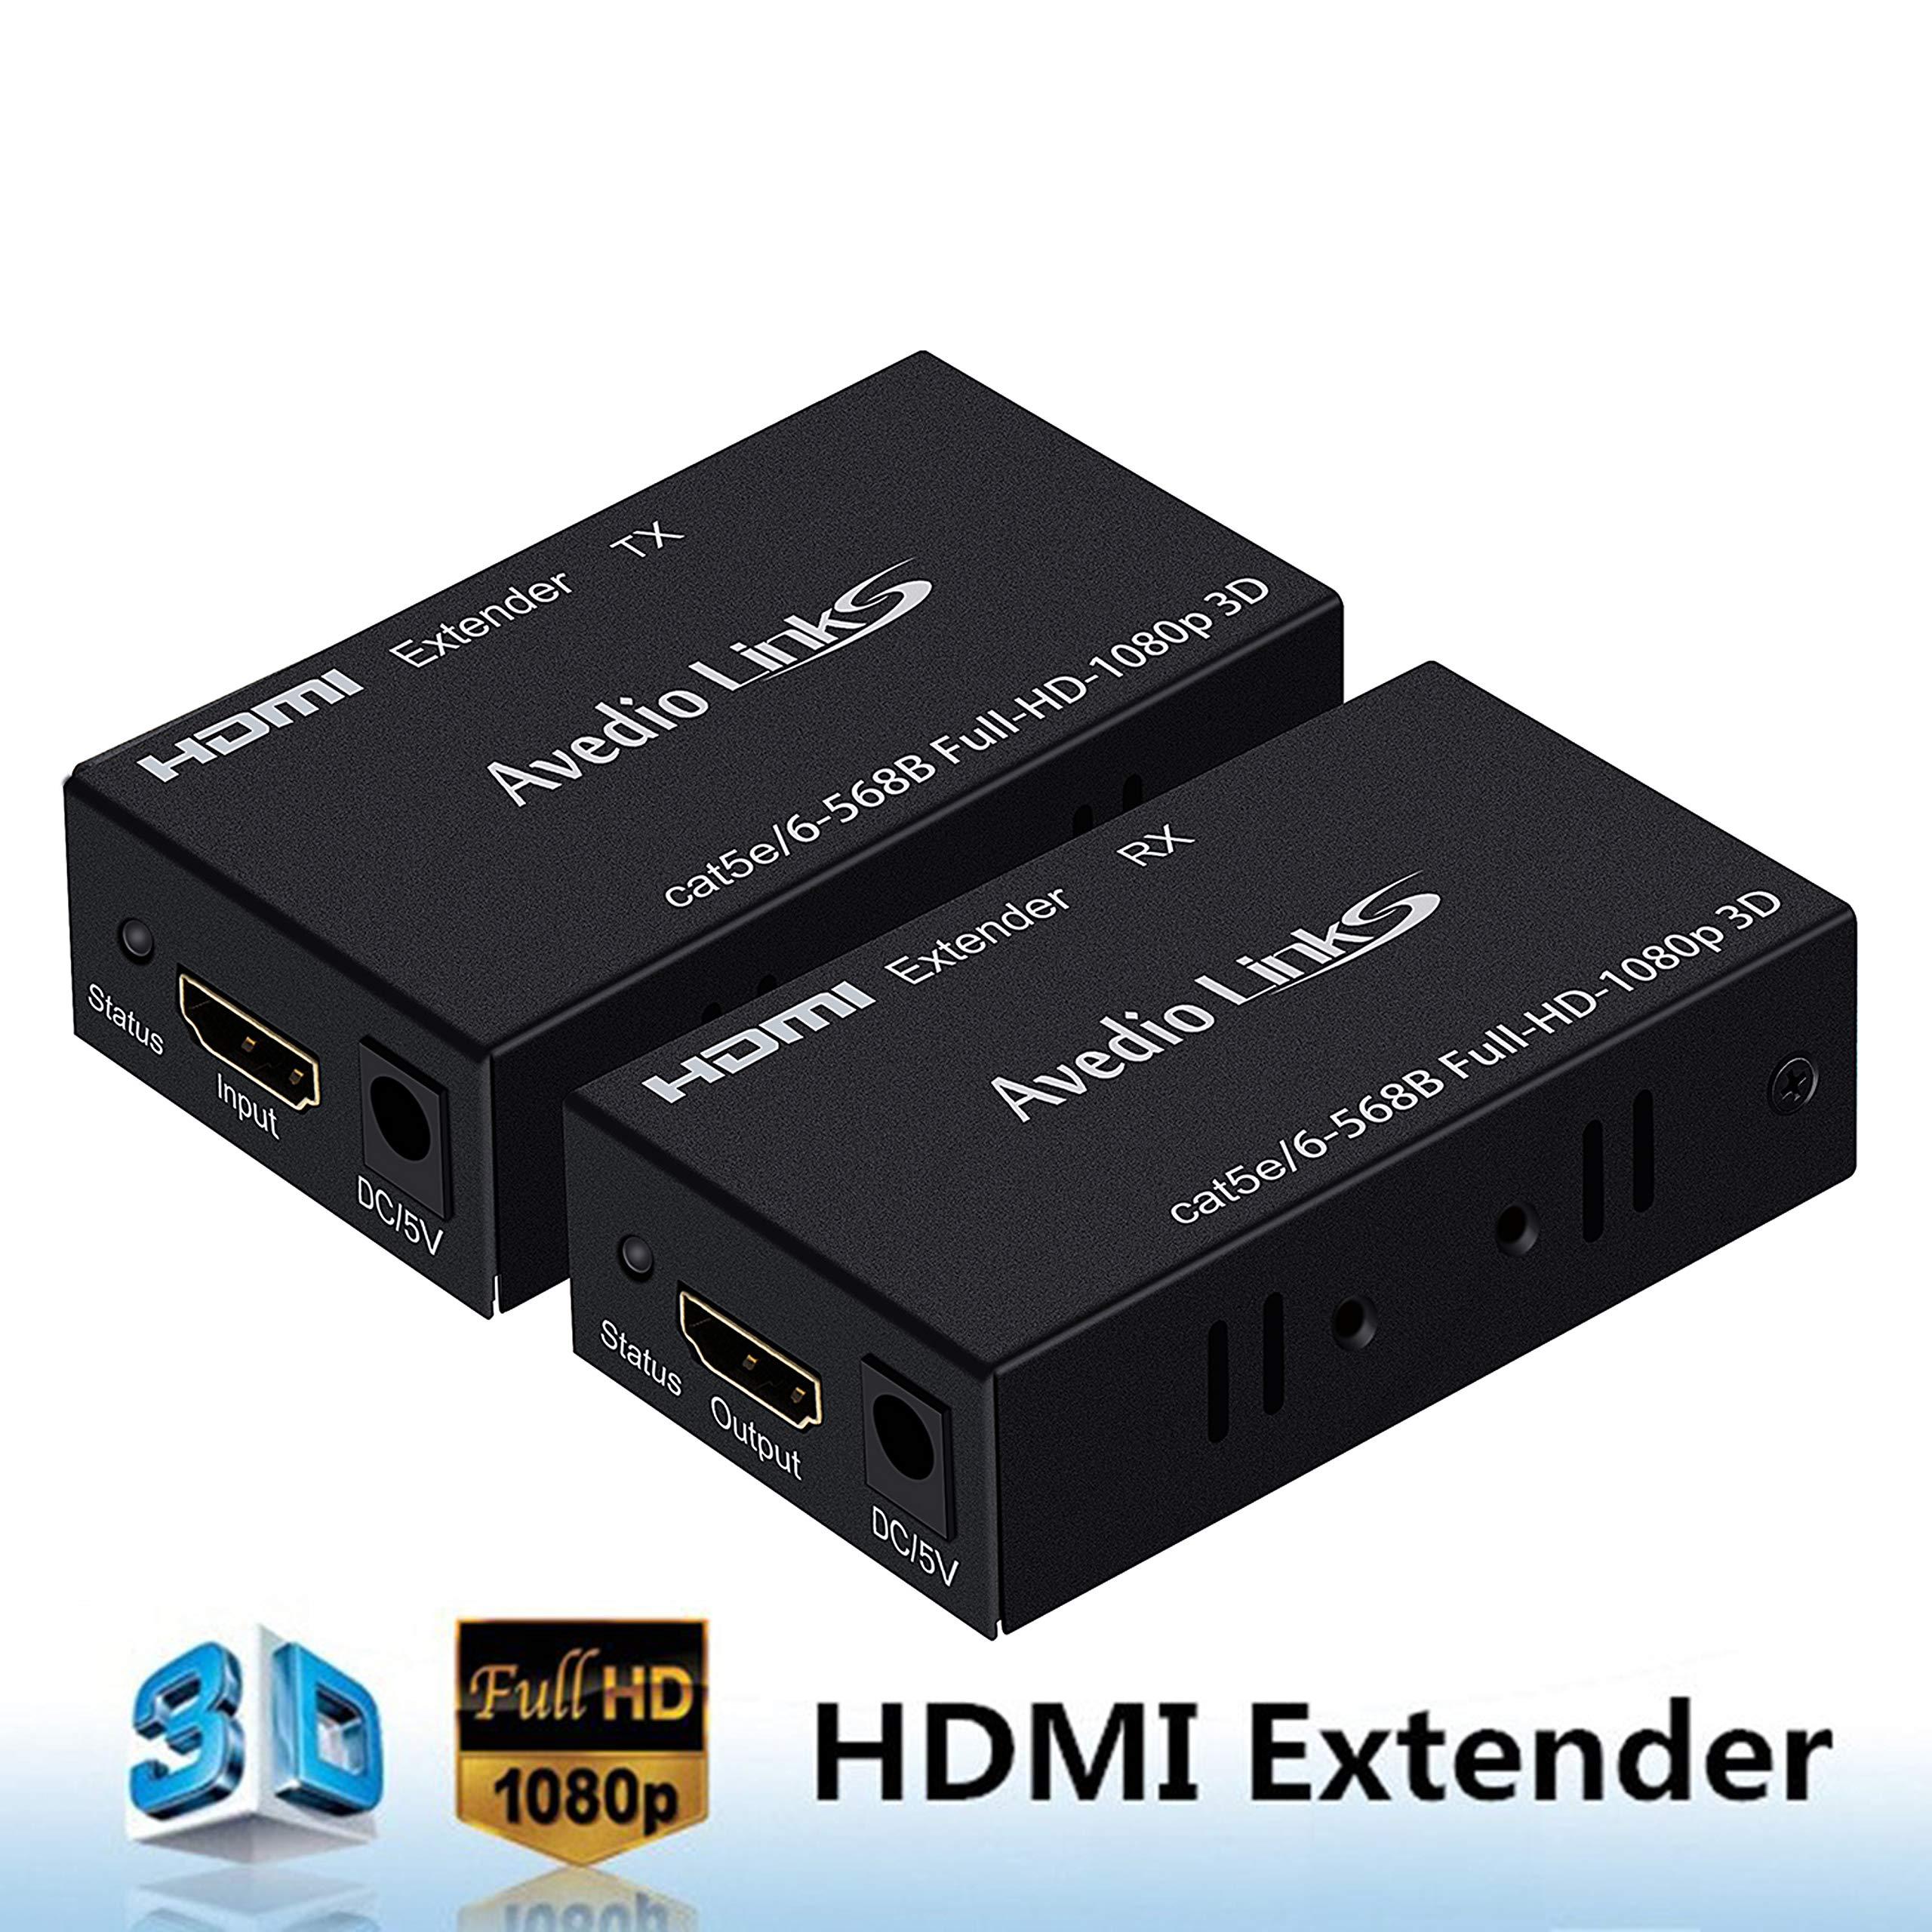 avedio links Extender Transmitter Receiver